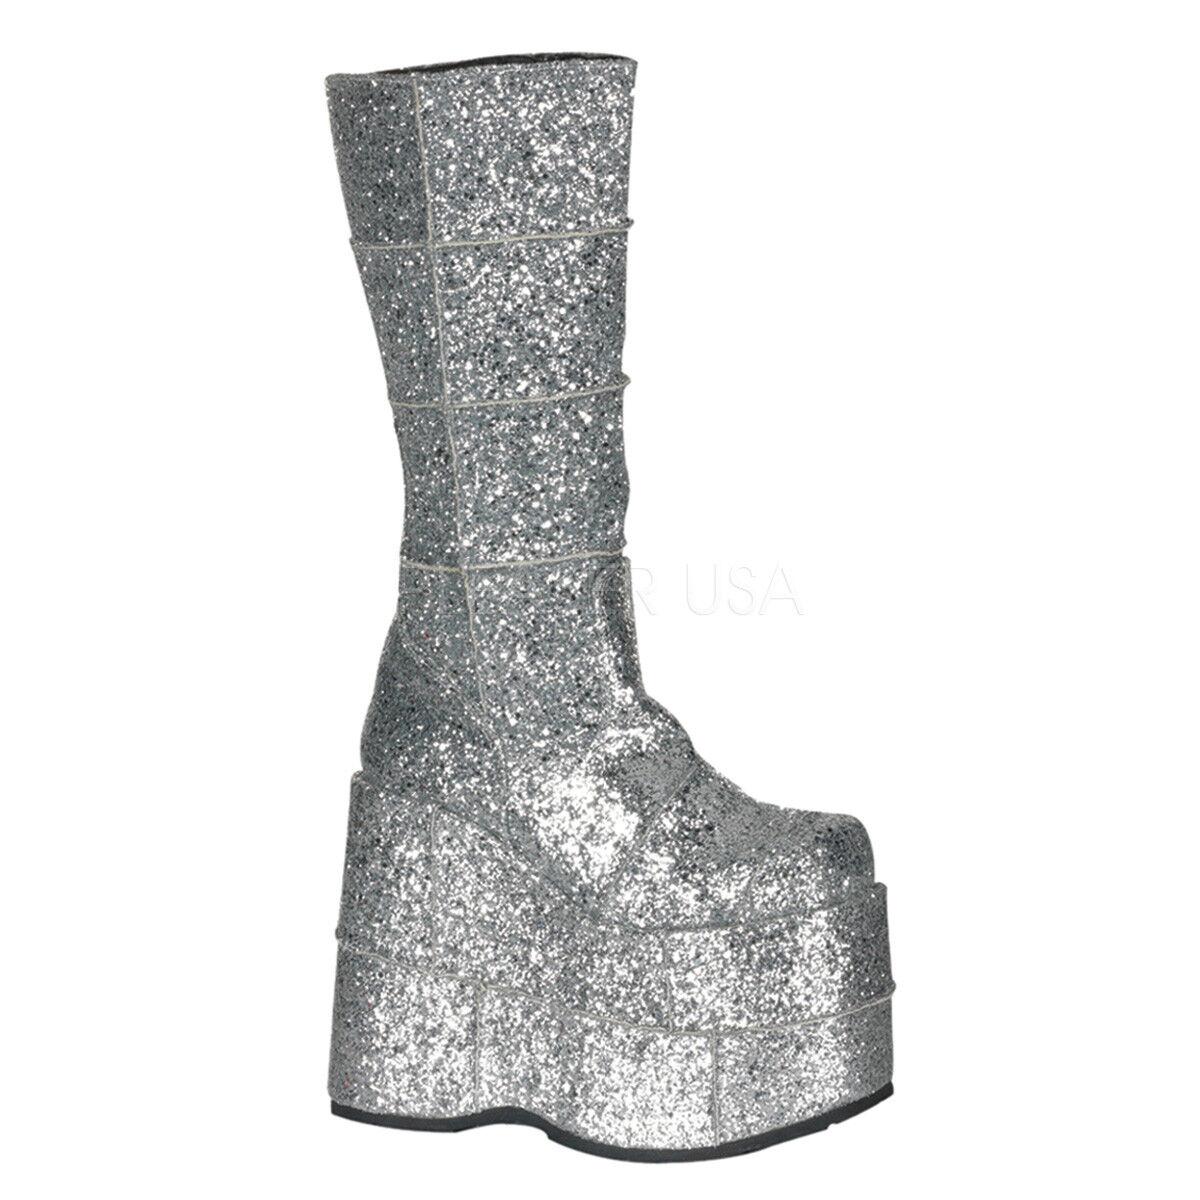 Demonia MEN'S Silver Glitter 7